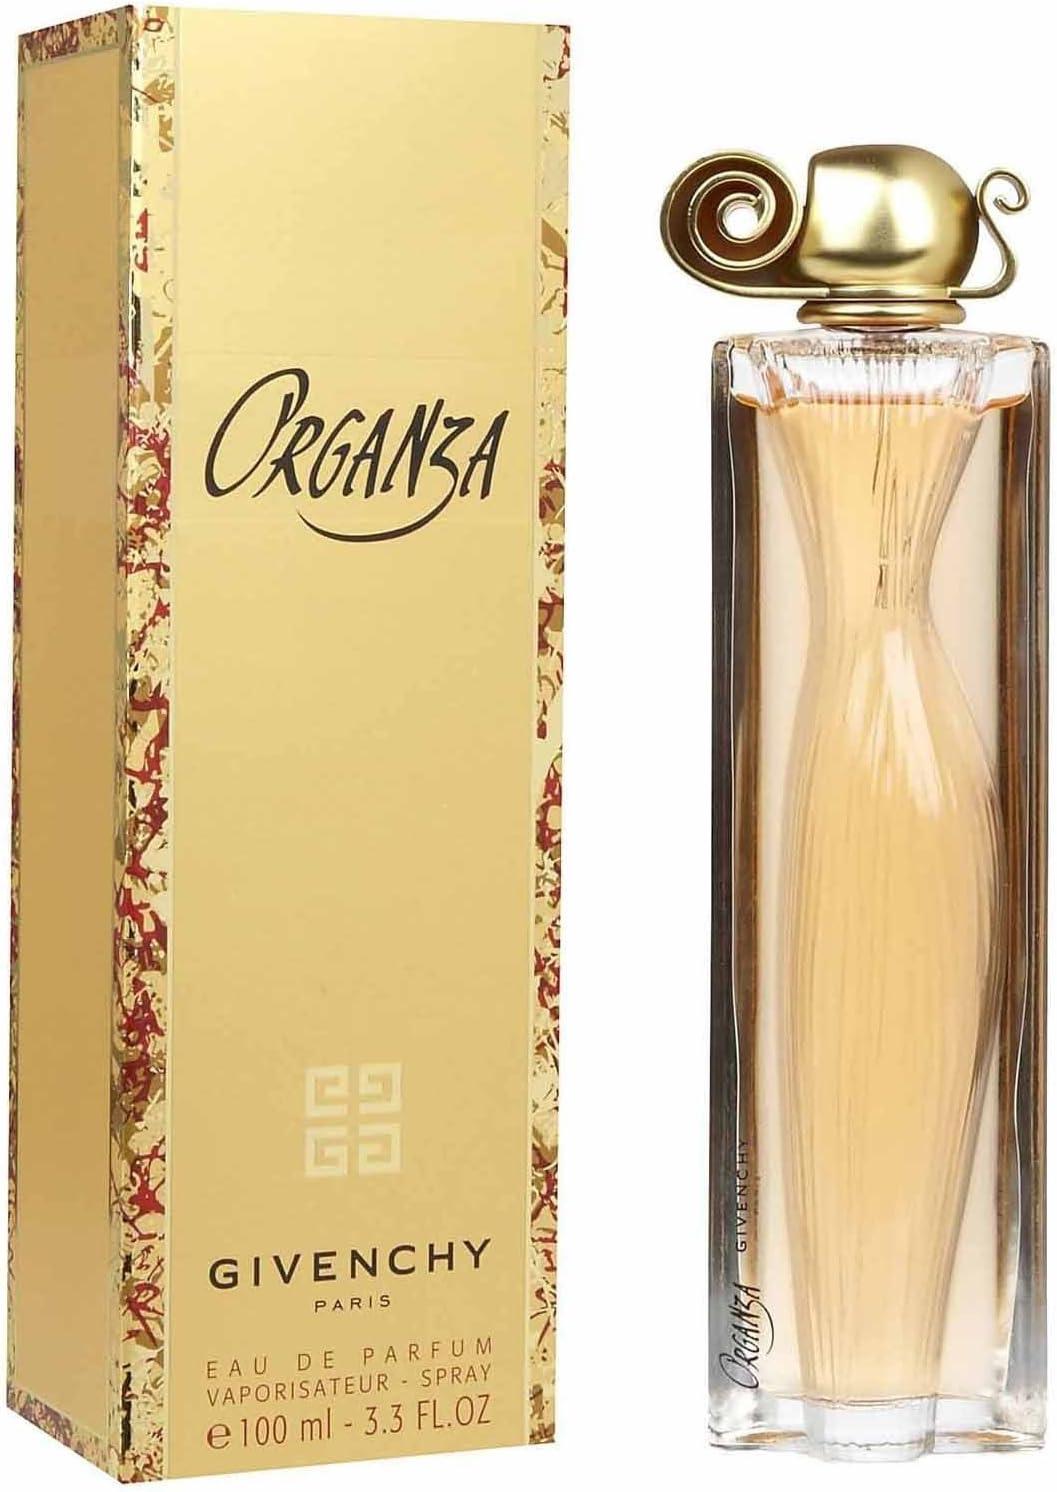 Givenchy Perfume - 100 ml